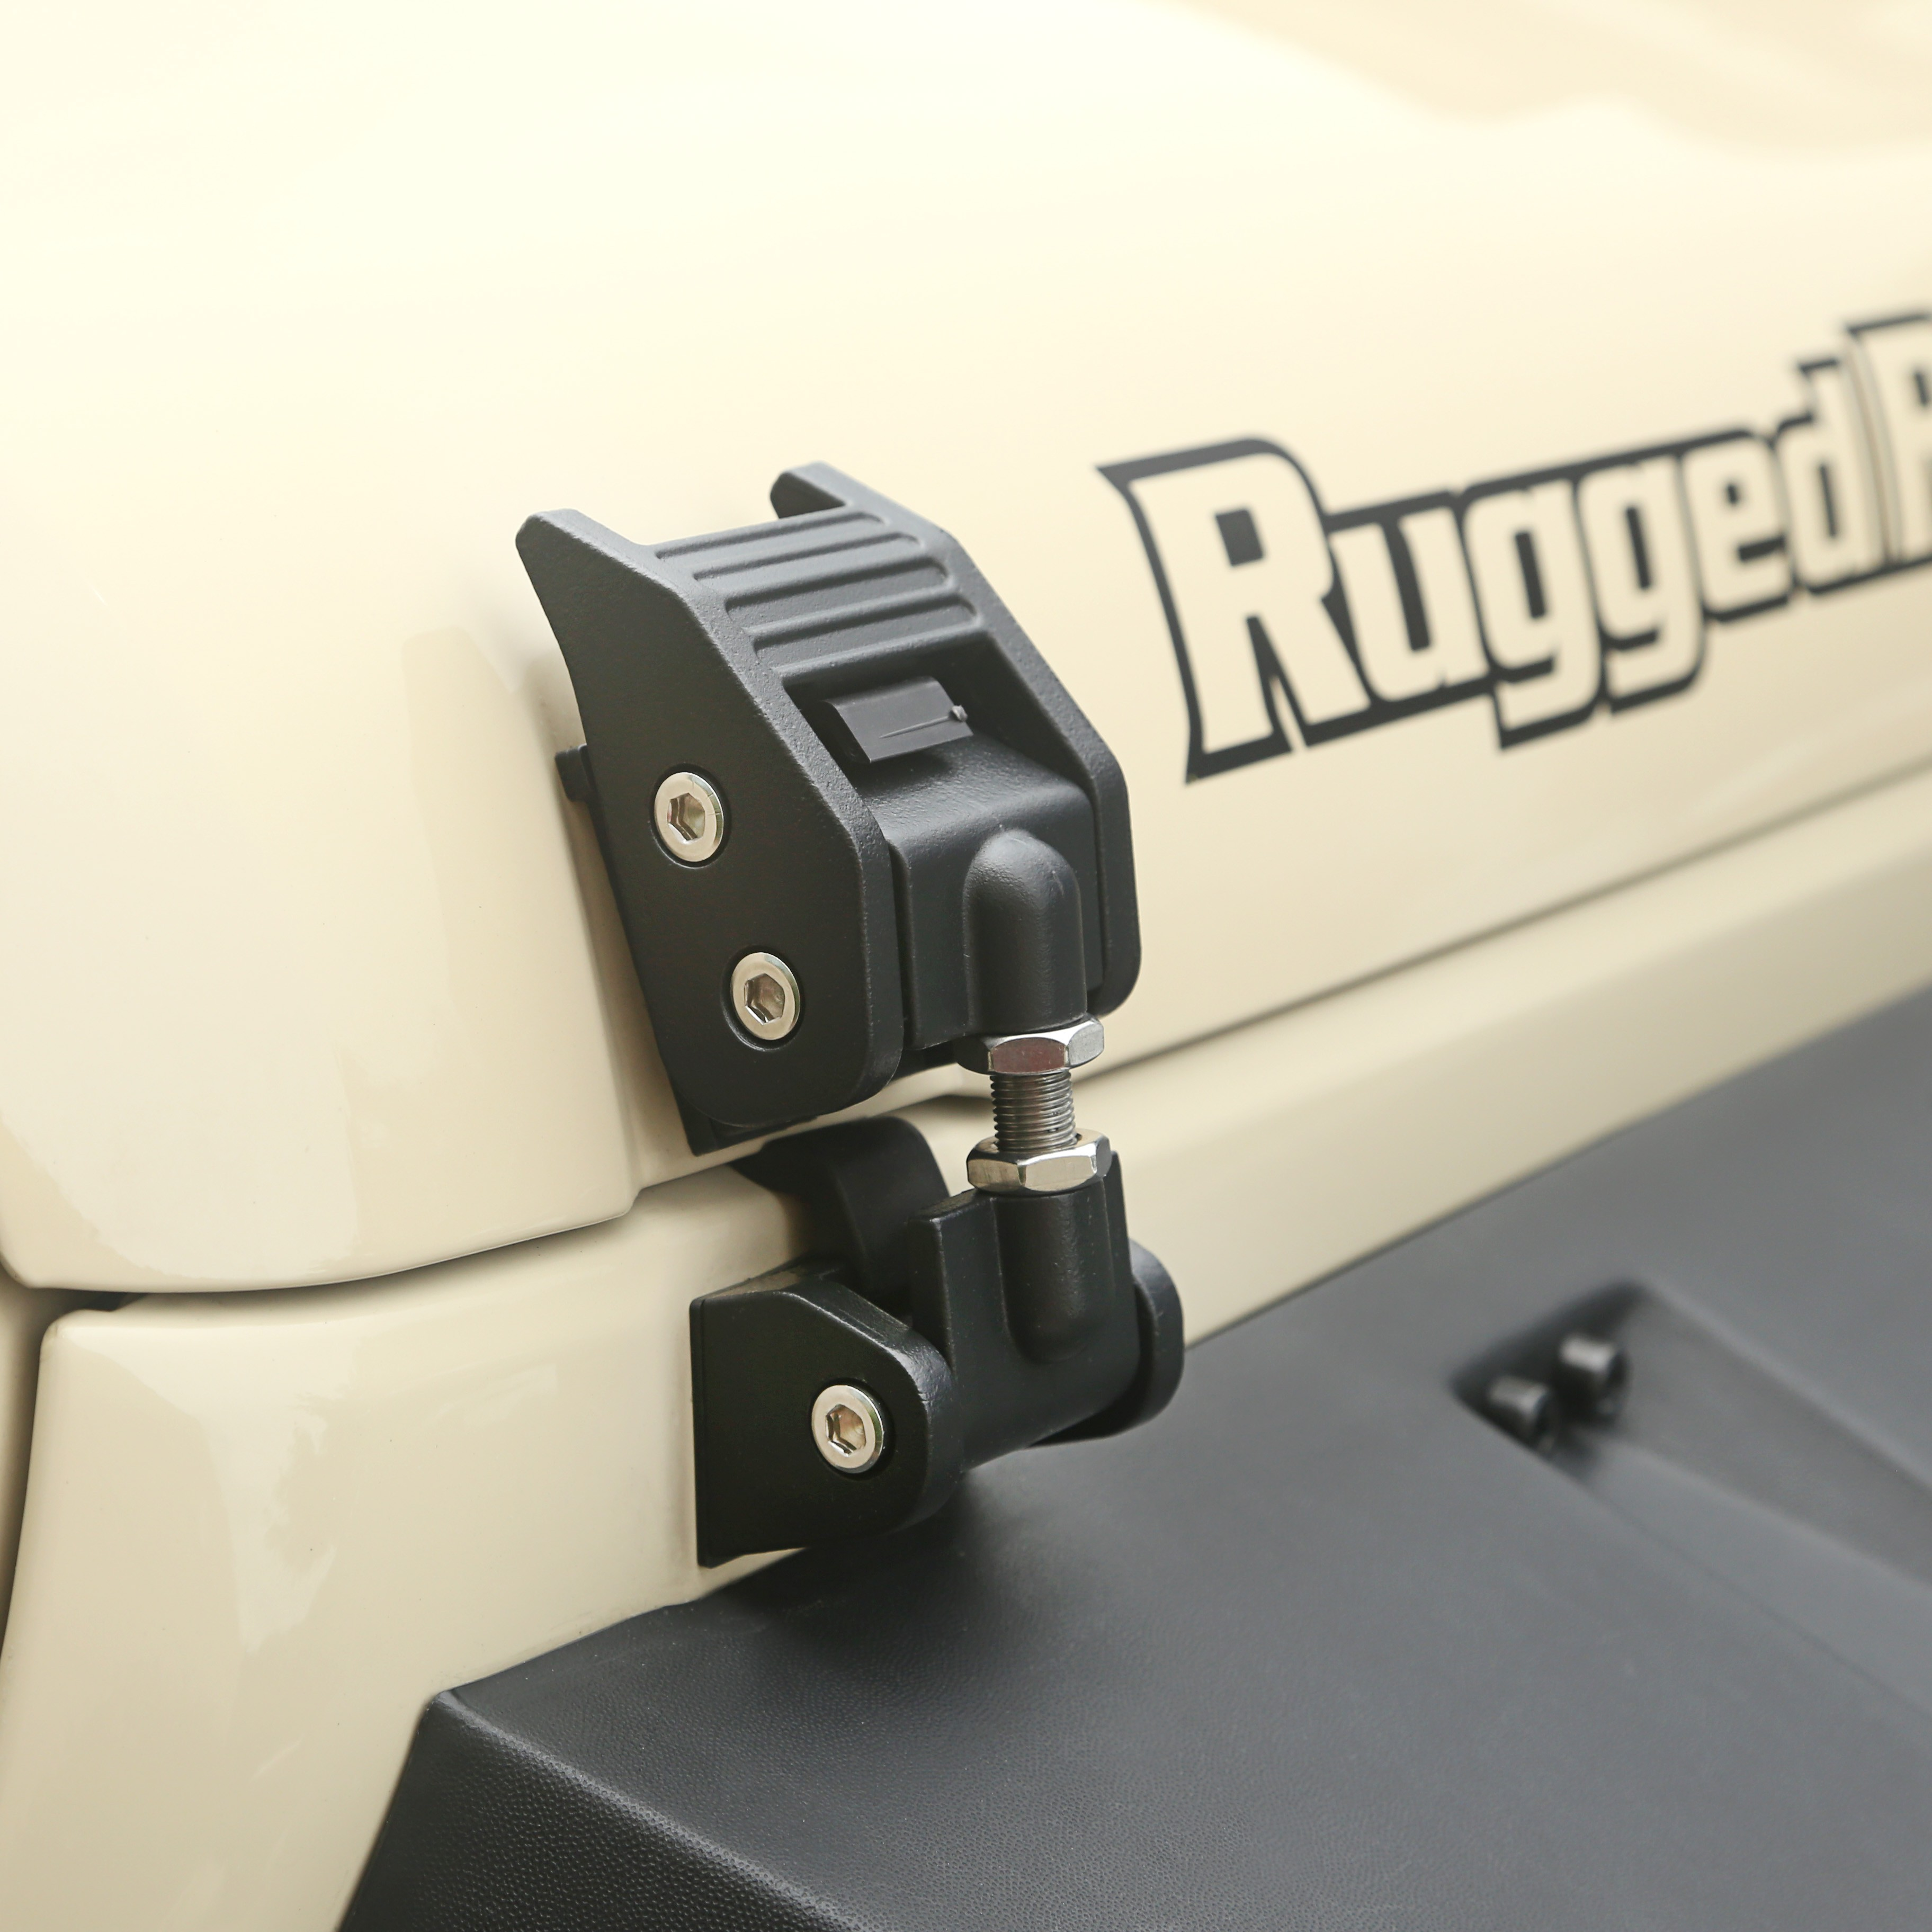 Hood Catches Textured Black Wrangler Jk 1121017 Jeepey Jeep Release Jm 02693